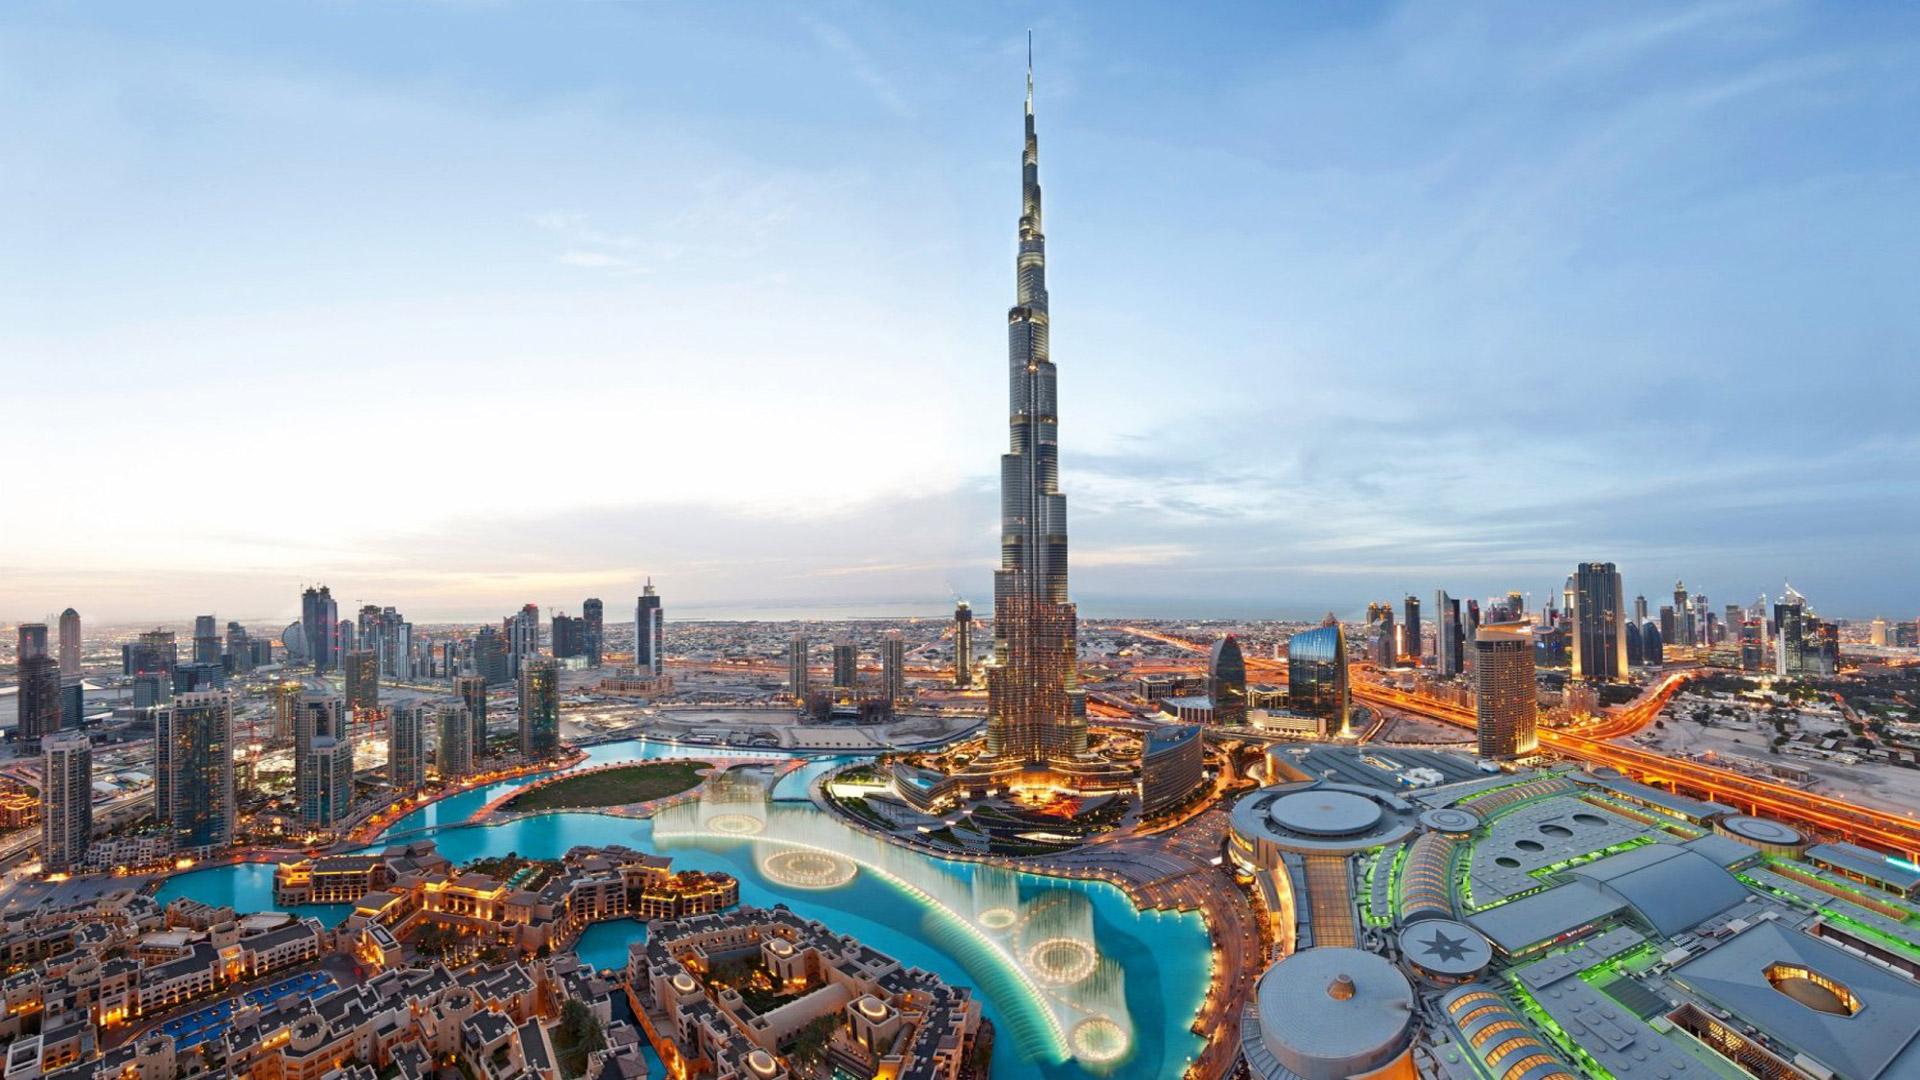 Downtown Dubai - 1